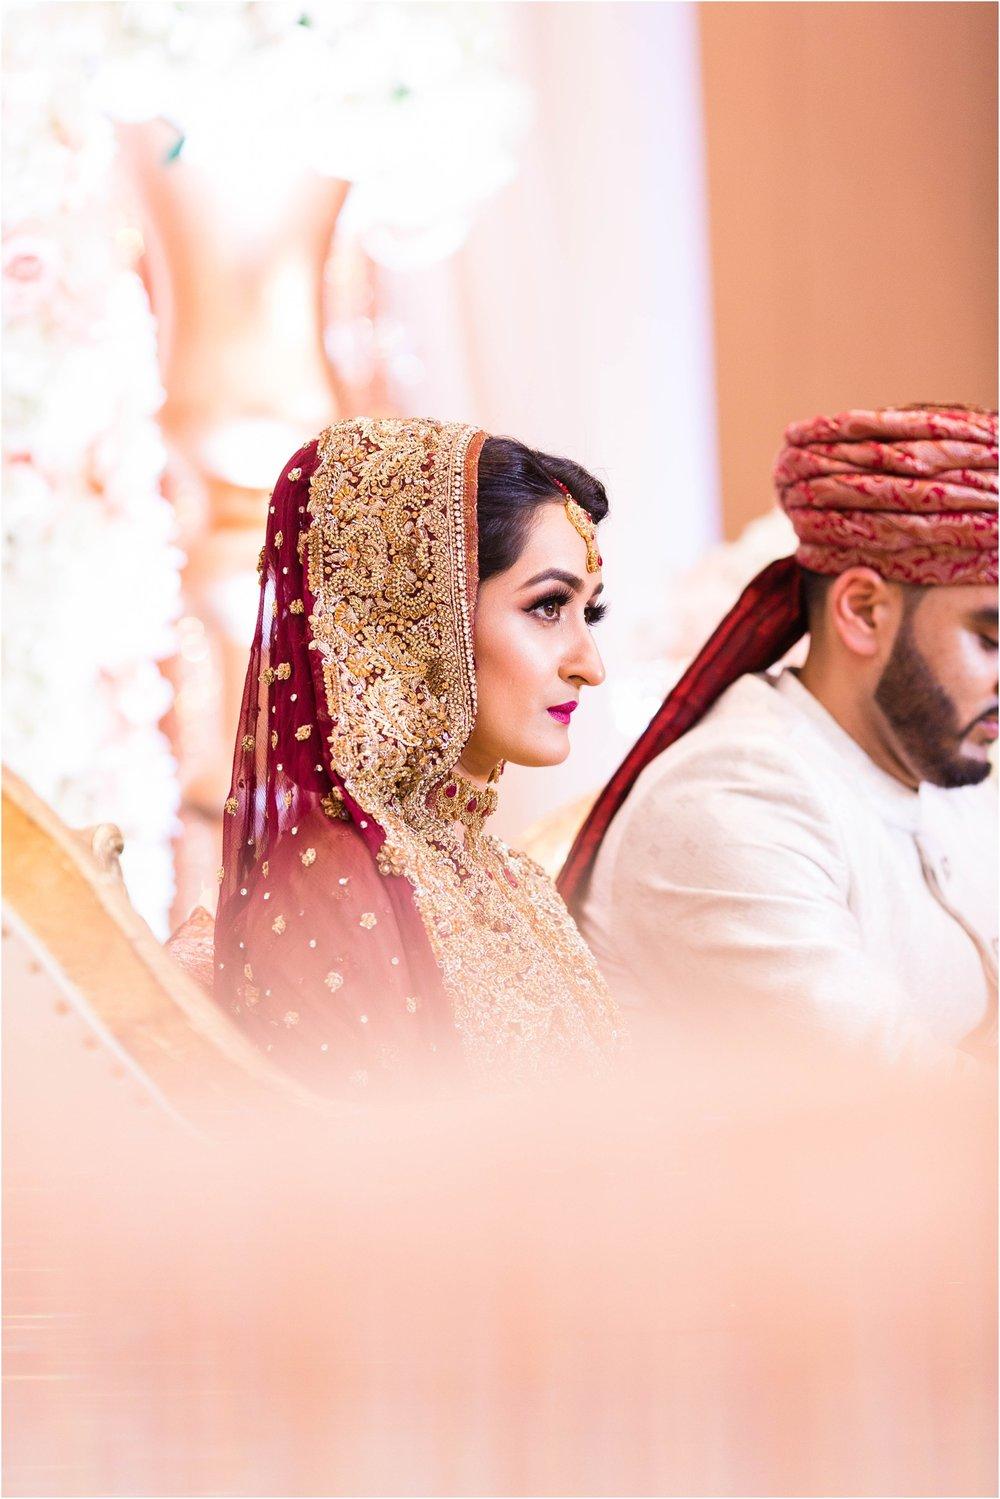 Scarborough-Convention-Centre-Baraat-Toronto-Mississauga-Brampton-Scarborough-GTA-Pakistani-Indian-Wedding-Engagement-Photographer-Photography_0028.jpg